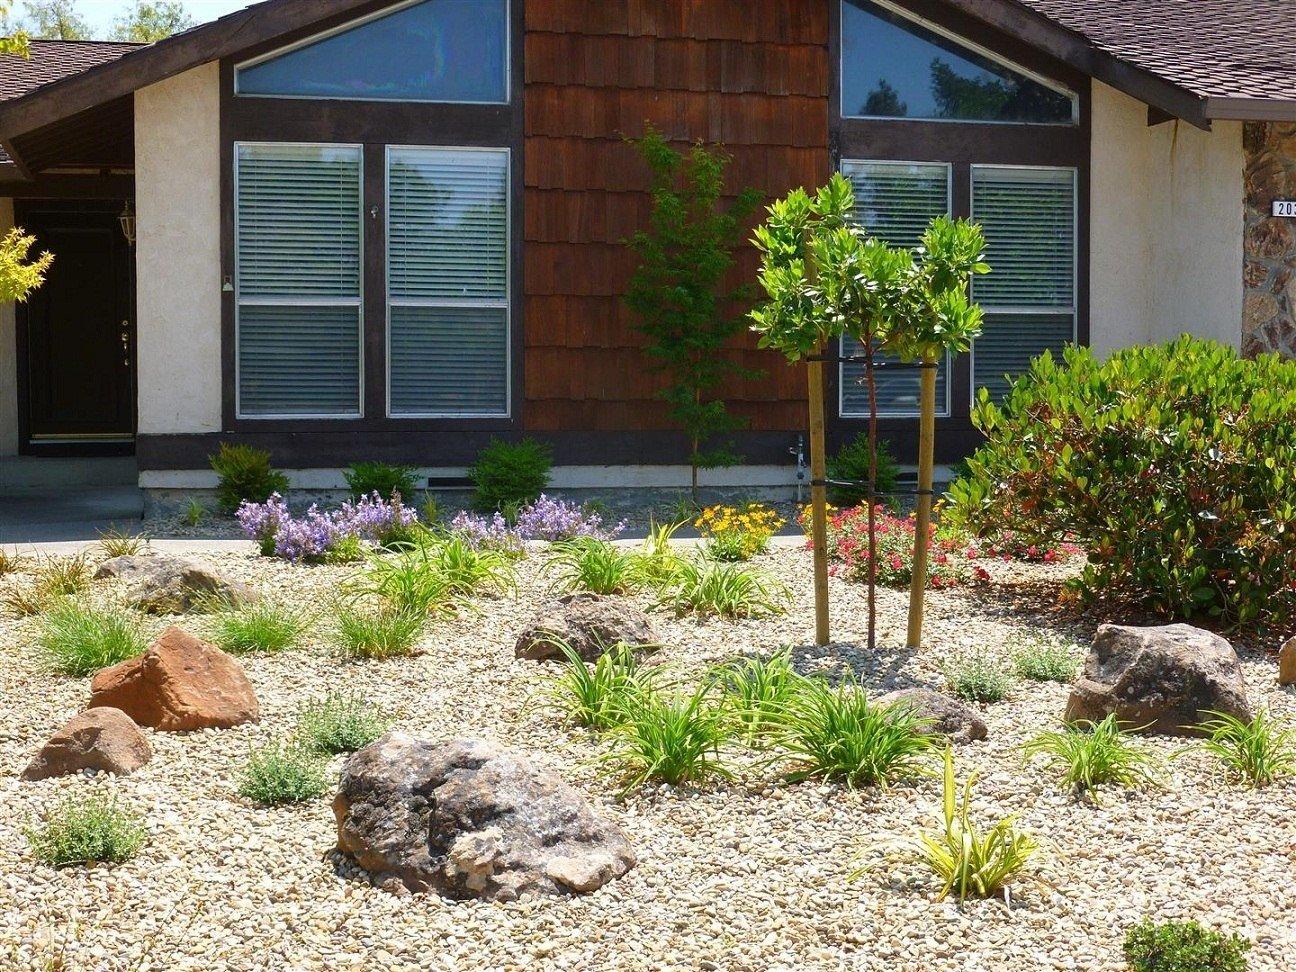 10 Attractive Low Maintenance Landscaping Ideas For Front Yard low maintenance landscaping ideas lovely best low maintenance 2021